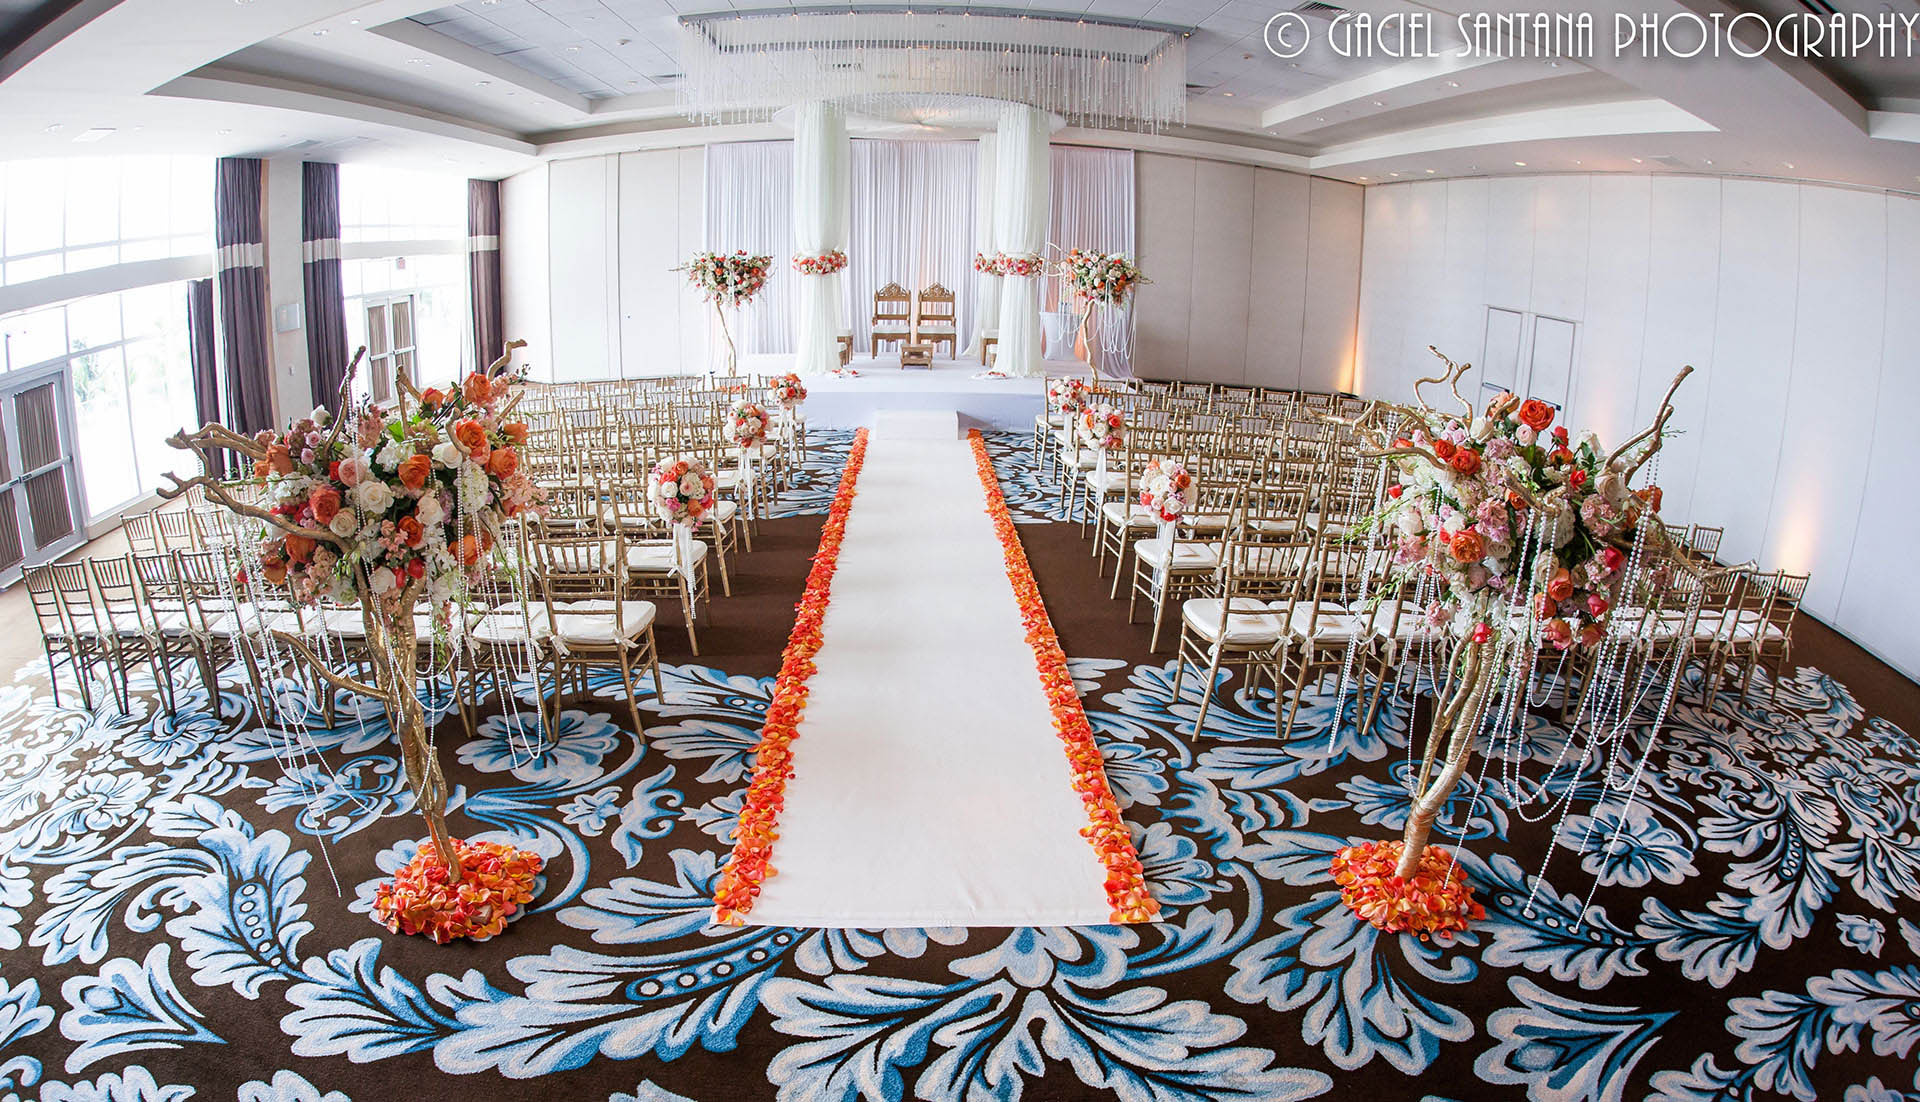 Modern White Wedding with a Spash of Citrus - Suhaag Garden